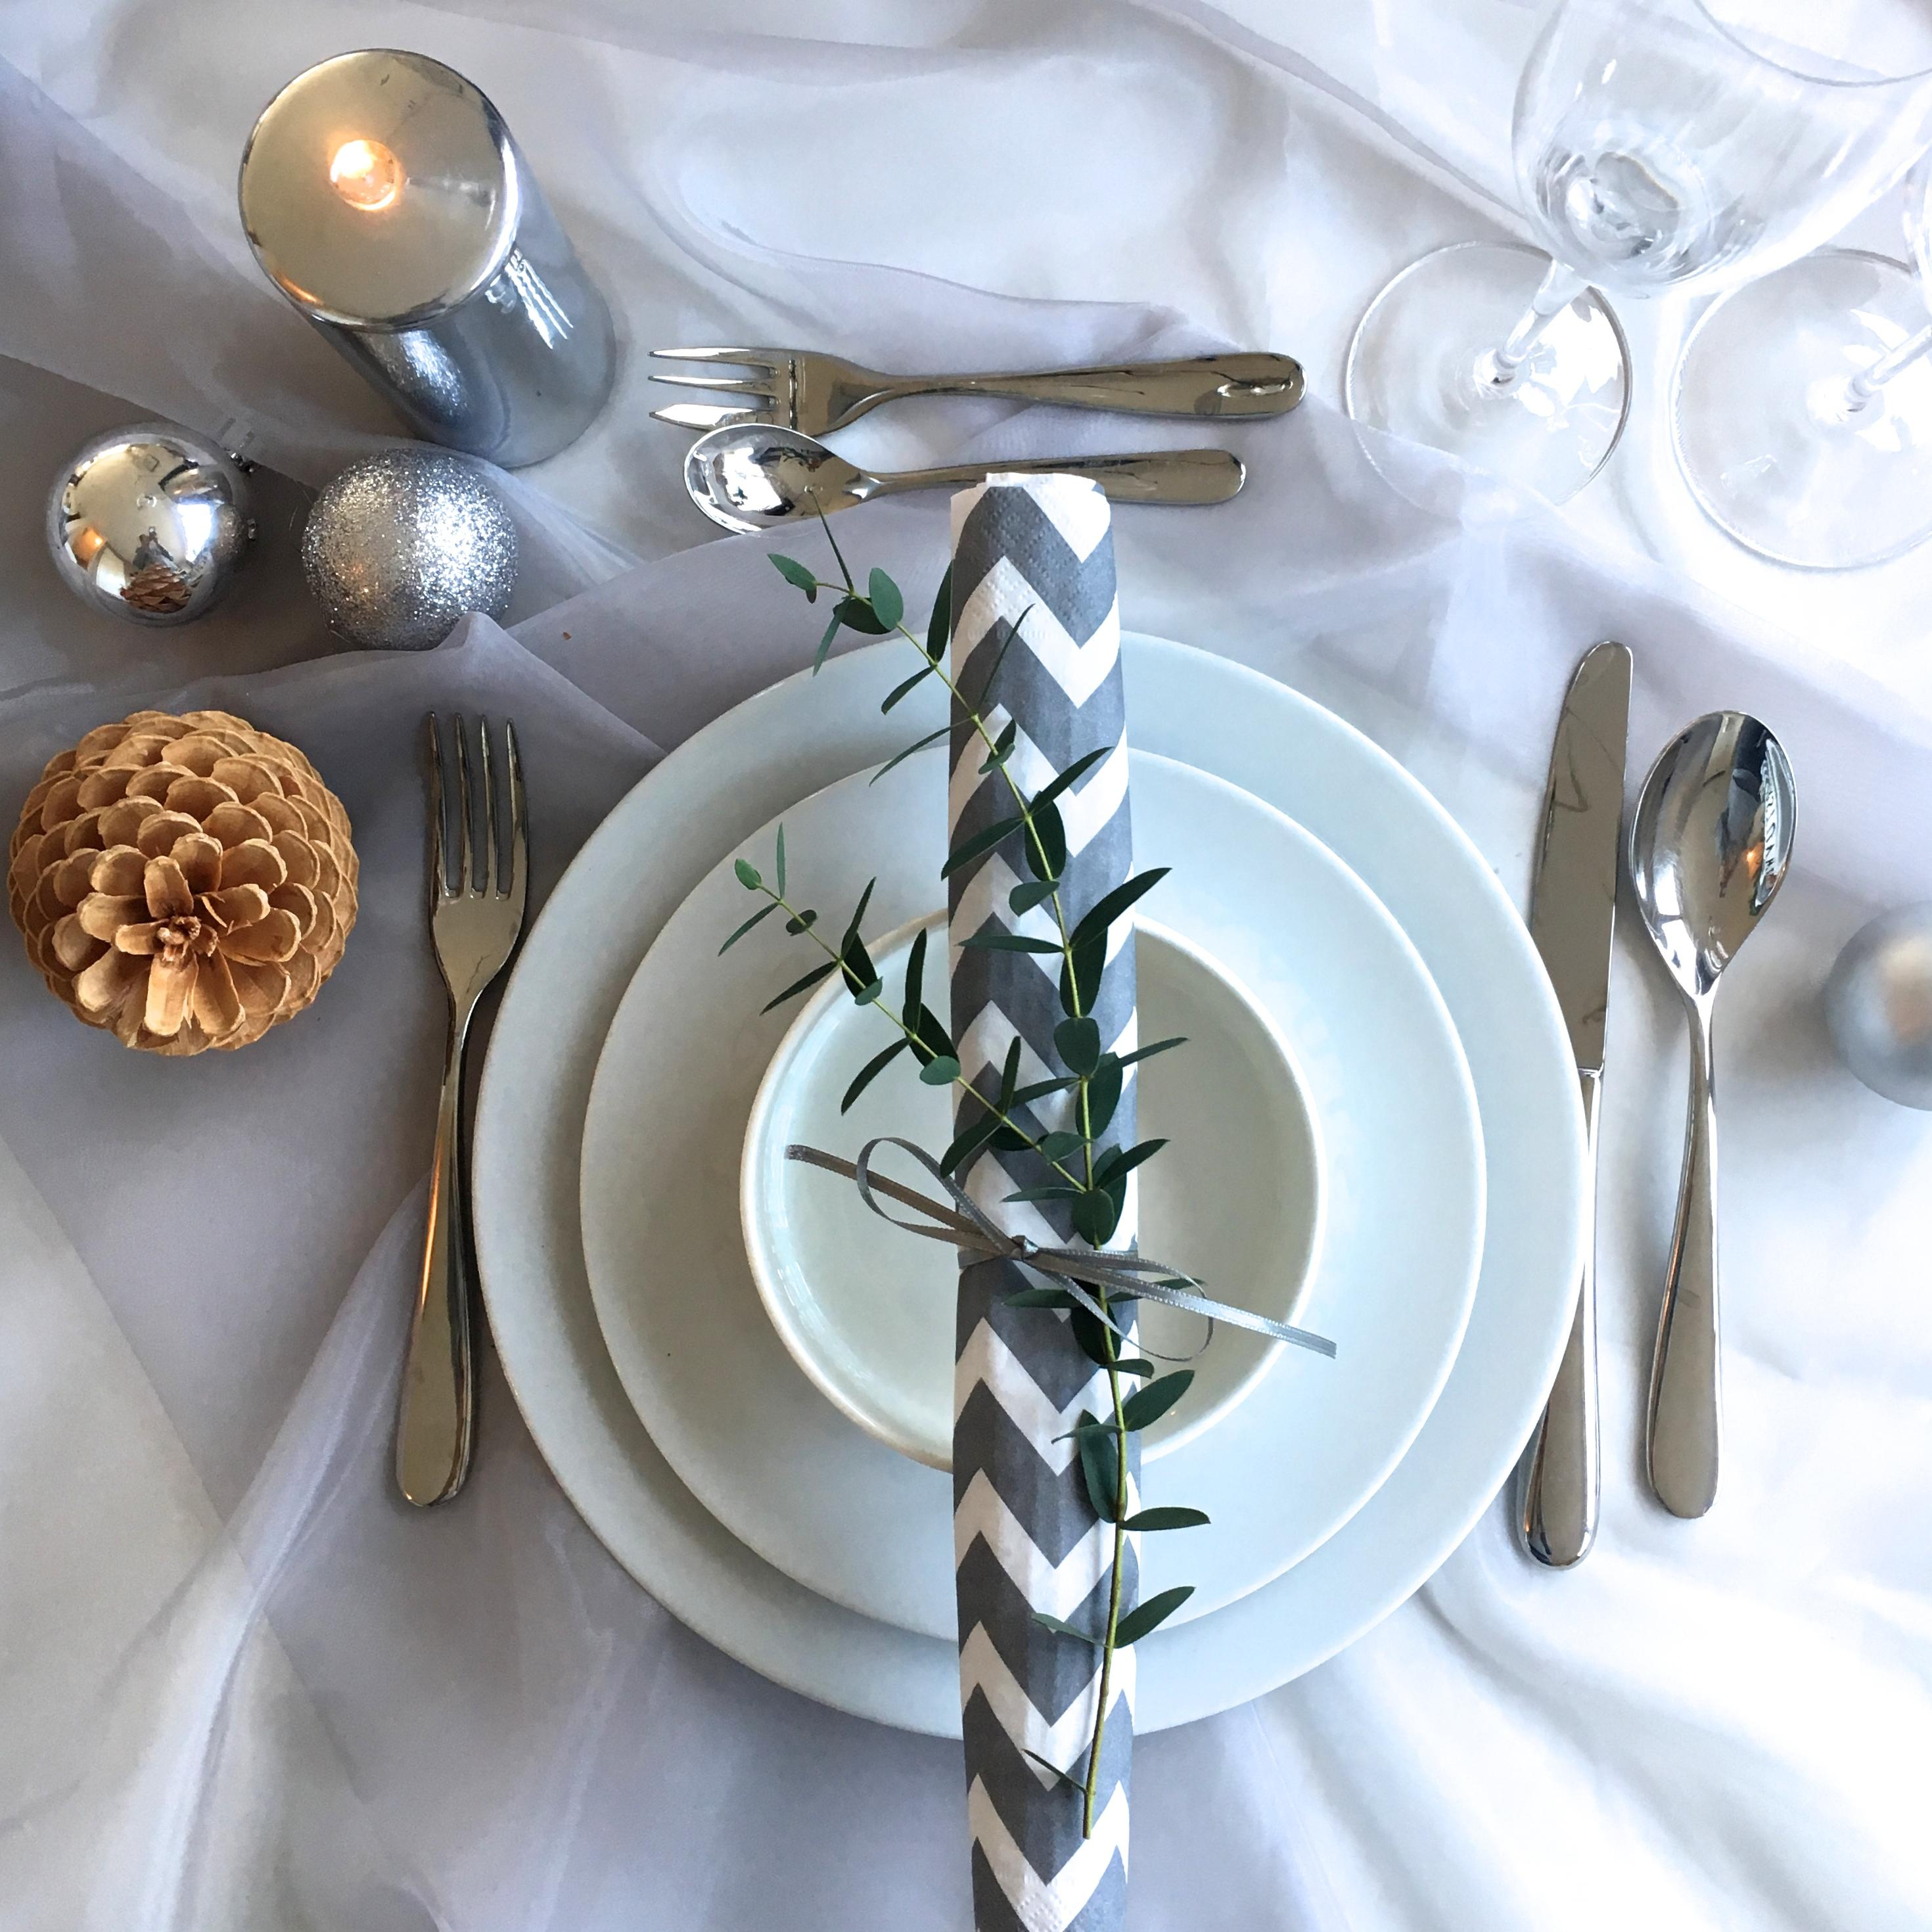 Tischdeko • Bilder & Ideen • COUCHstyle